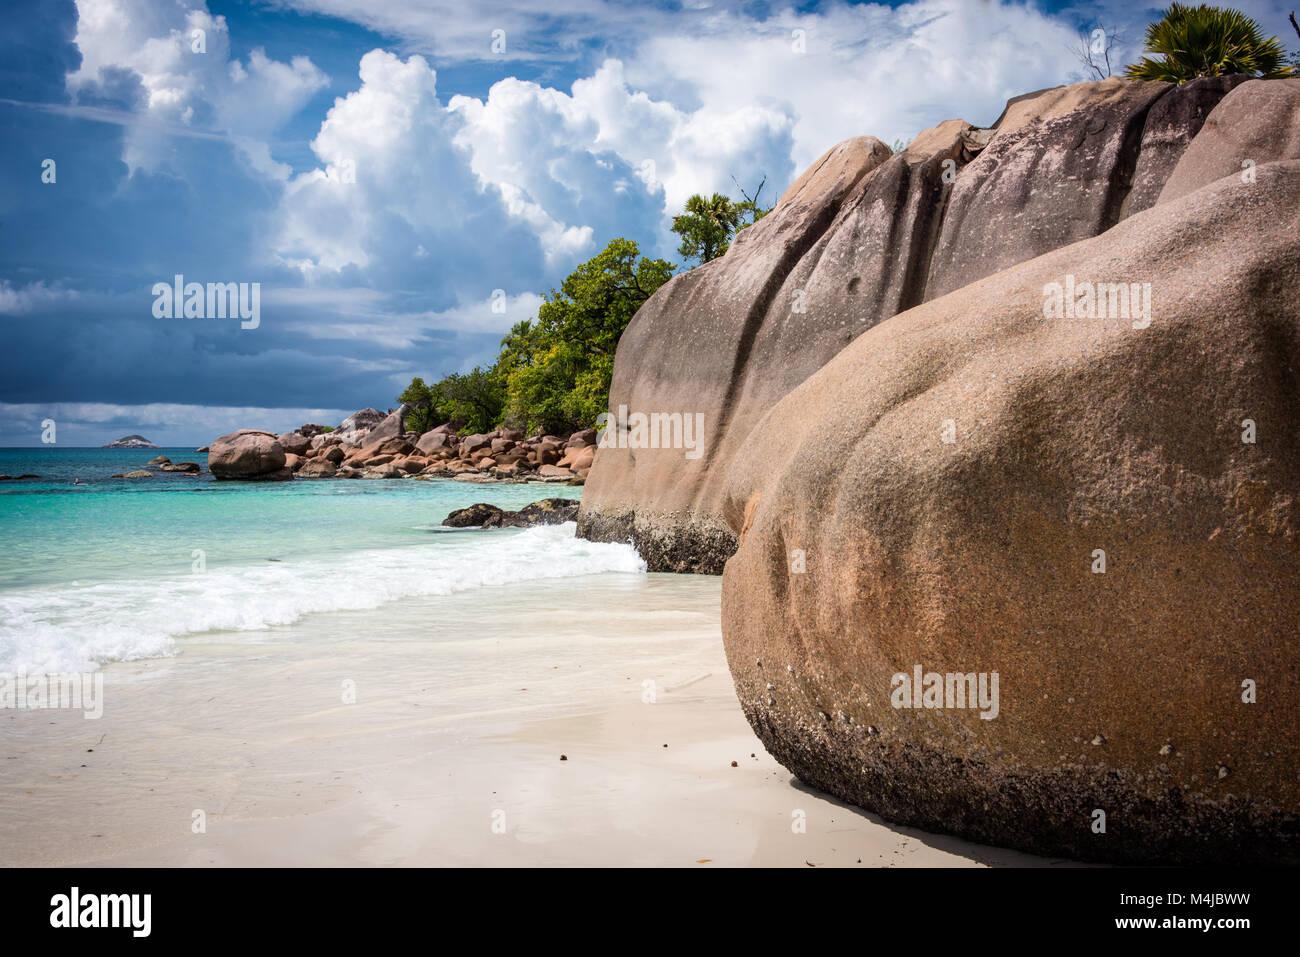 Anse Lazio, Praslin, Seychelles - Stock Image